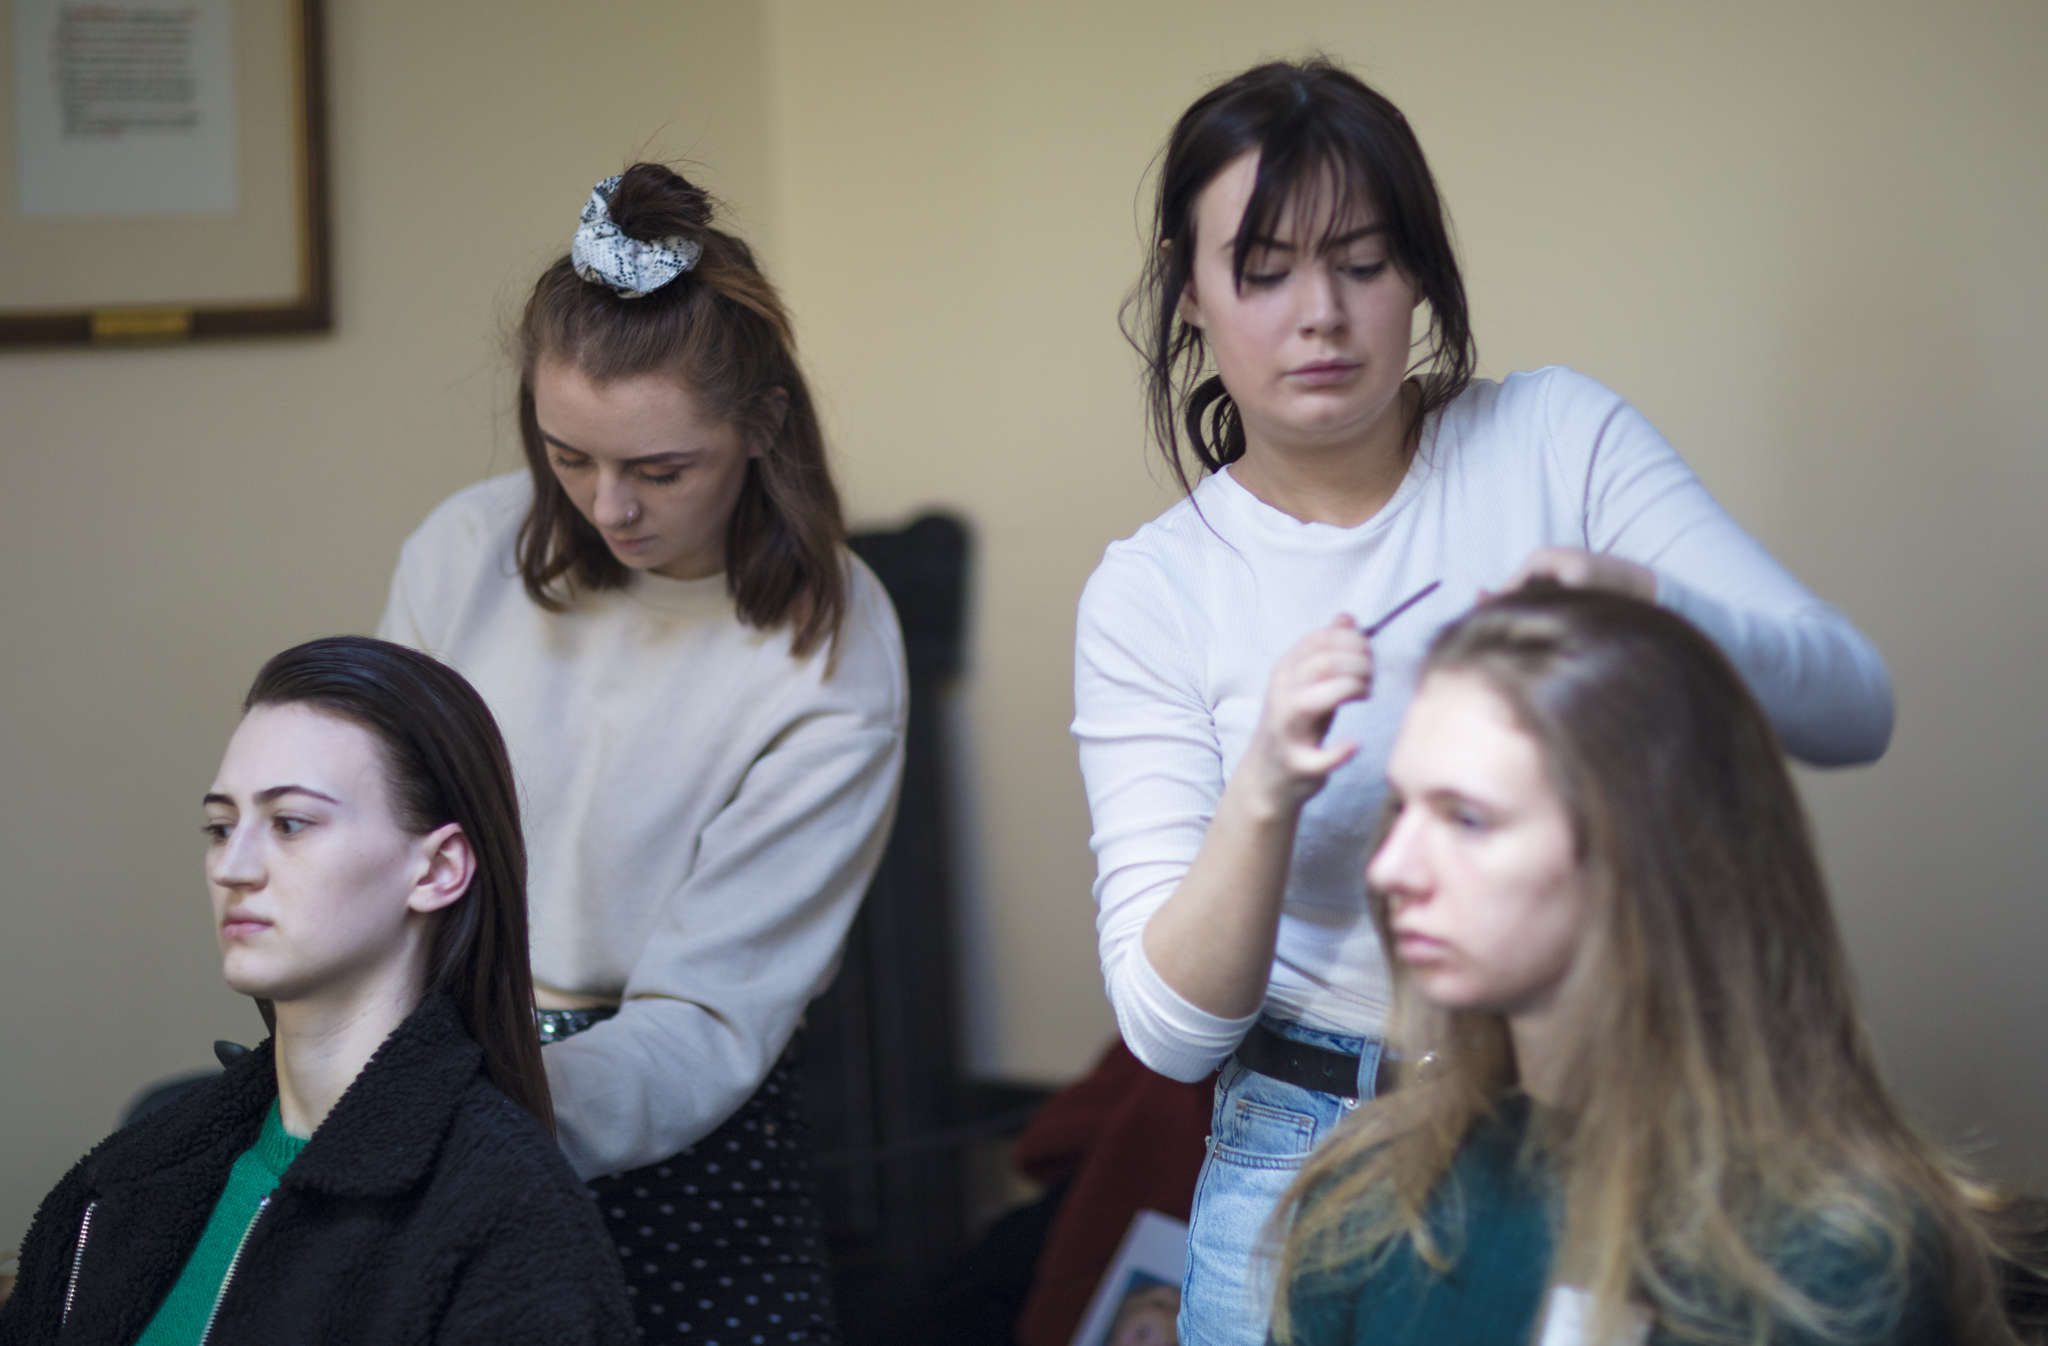 BTS hair stylists Aberdeen Fashion Show 2019.JPG